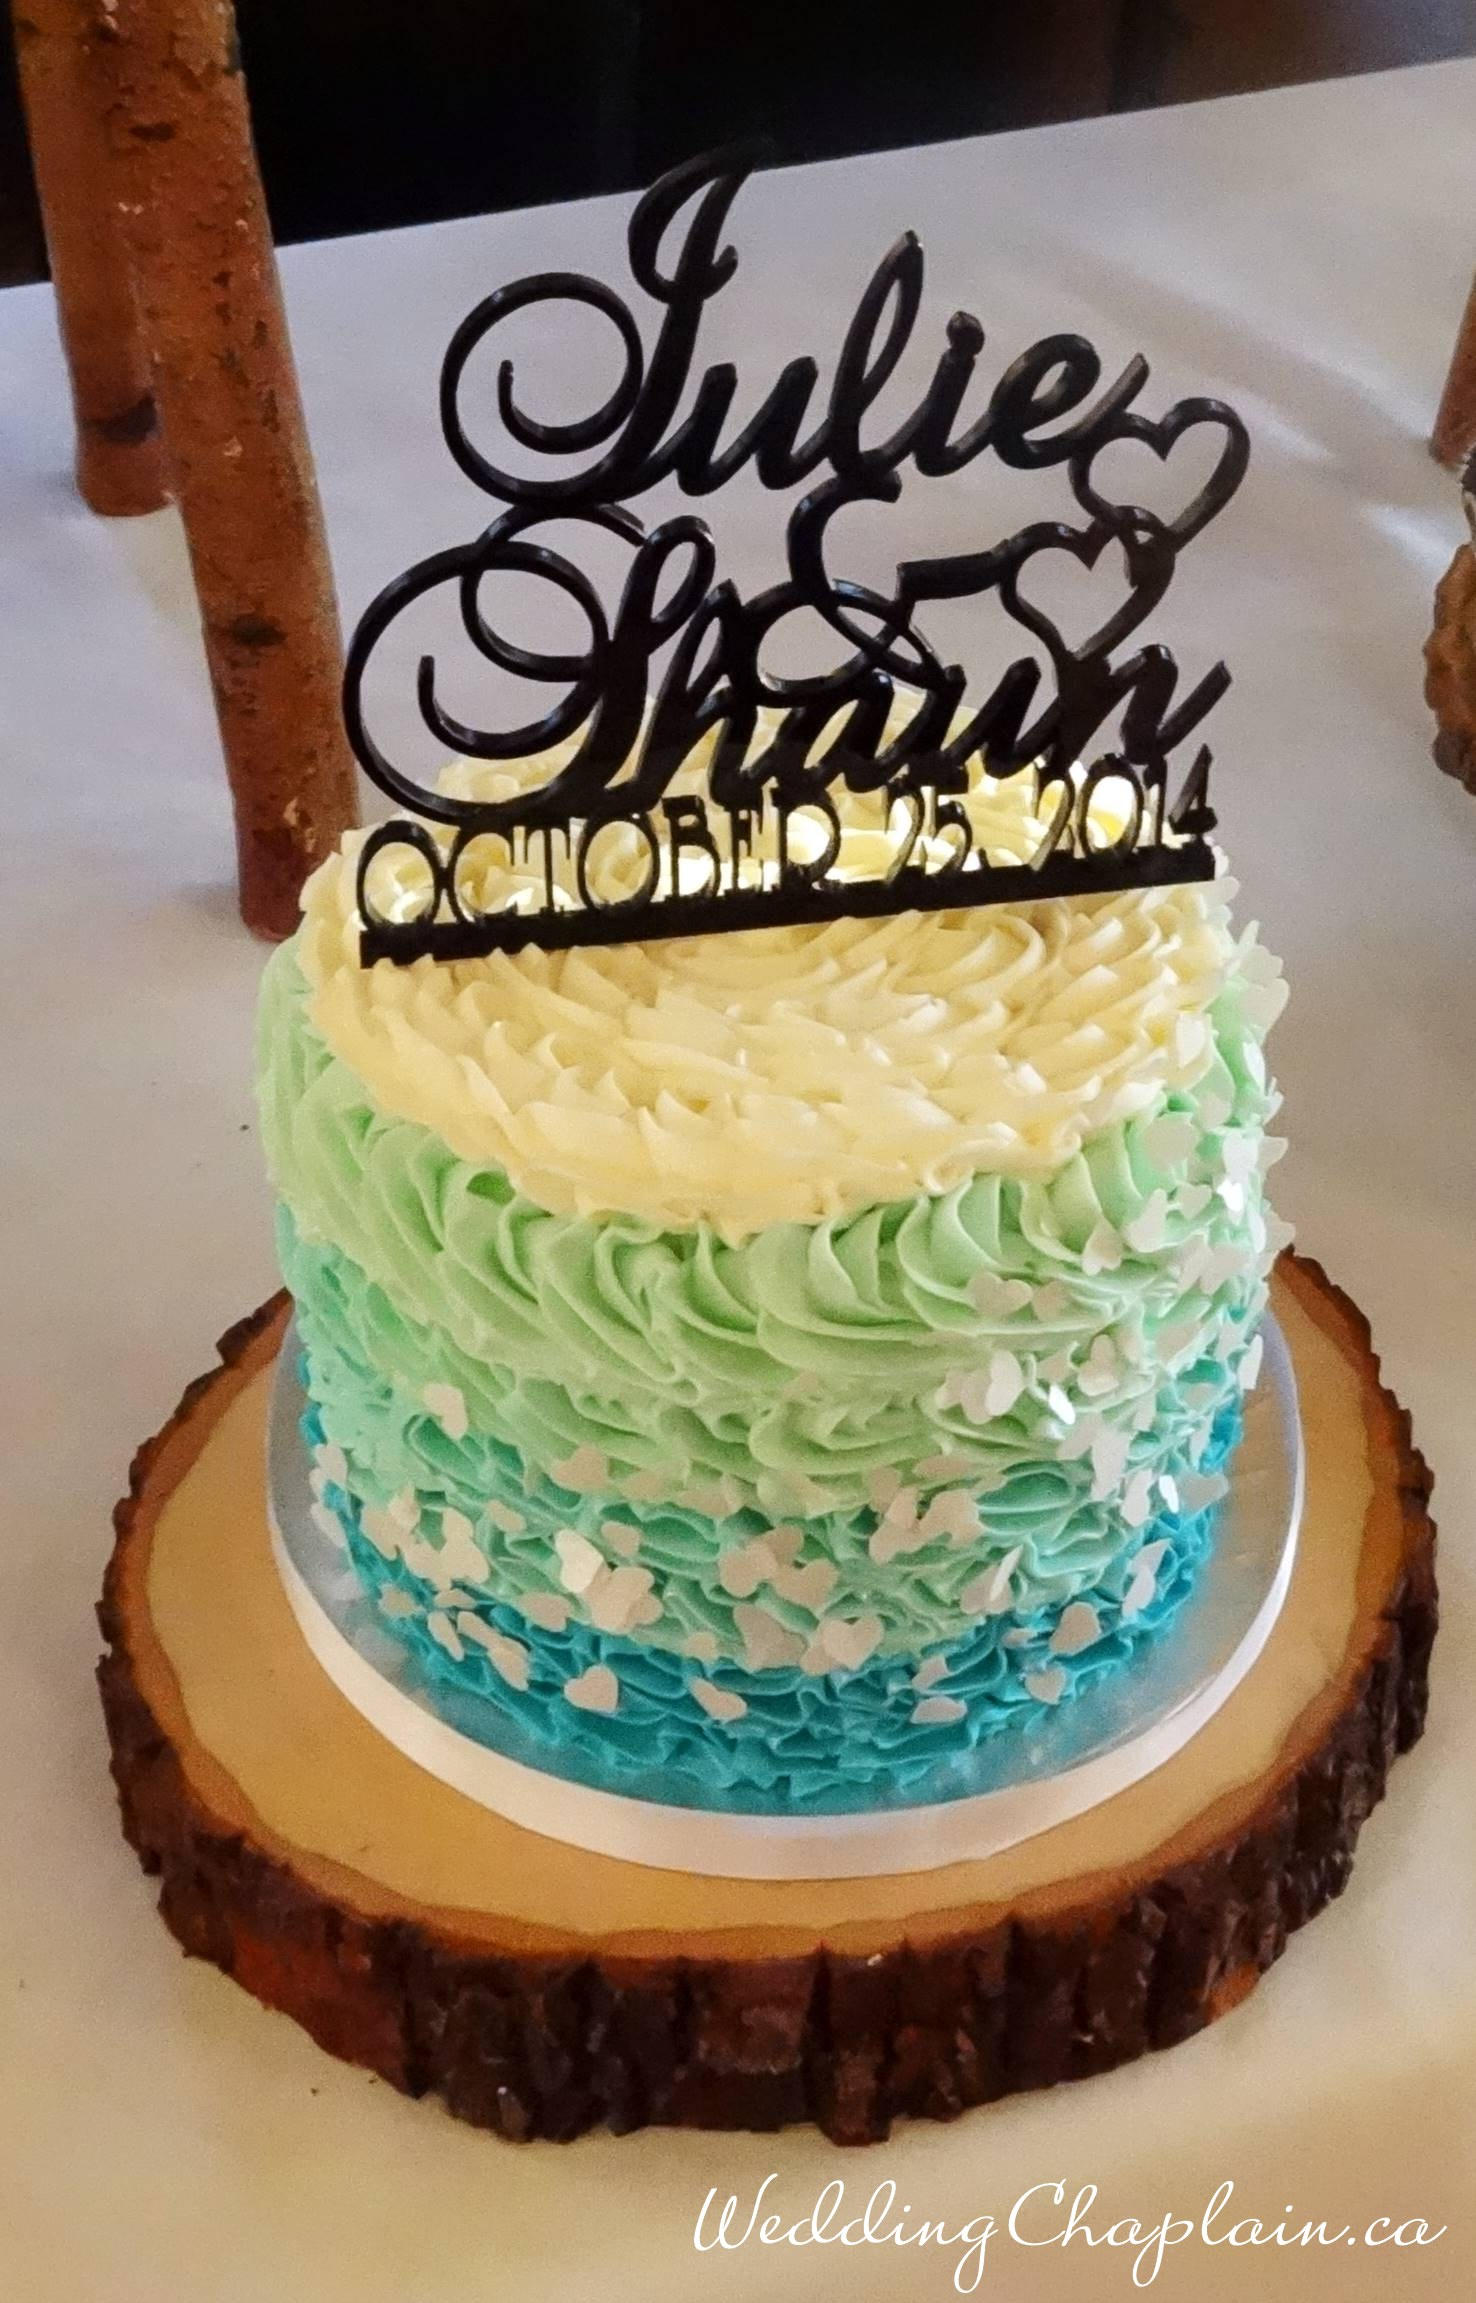 https://www.ottawaweddingmagazine.com/wp-content/uploads/2014/12/cake9.jpg